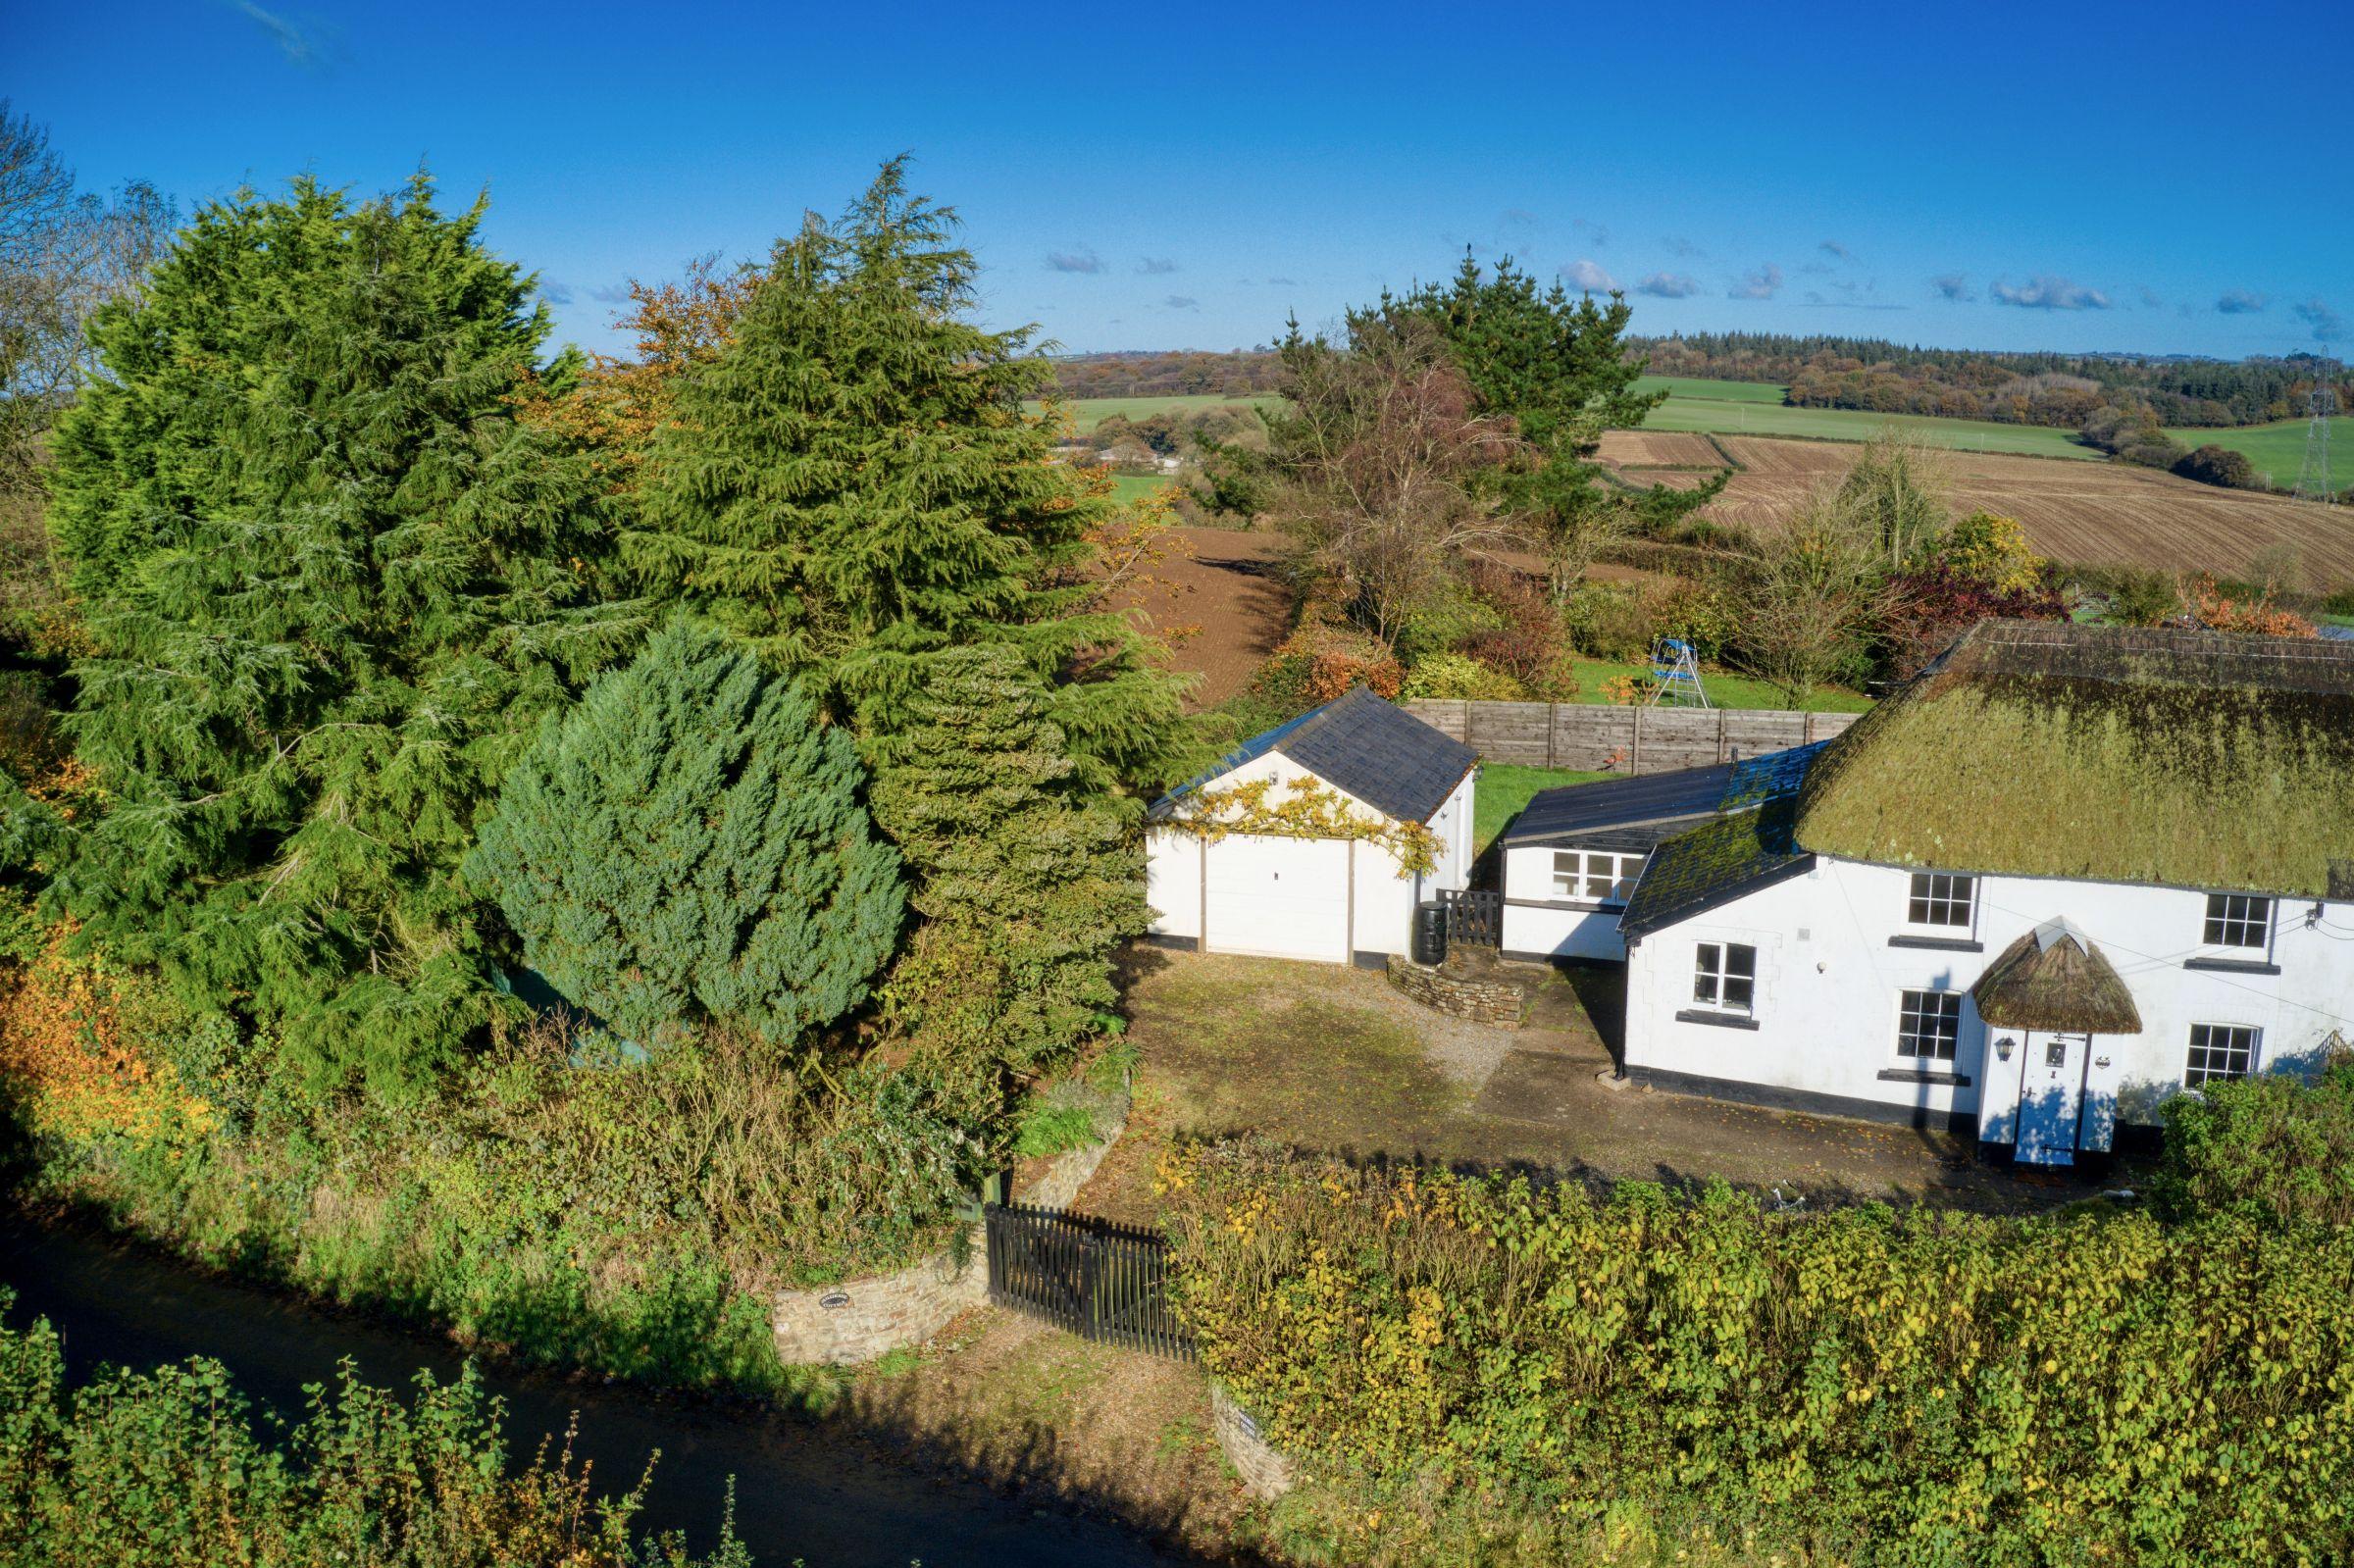 Milehouse Cottage, Chittlehampton